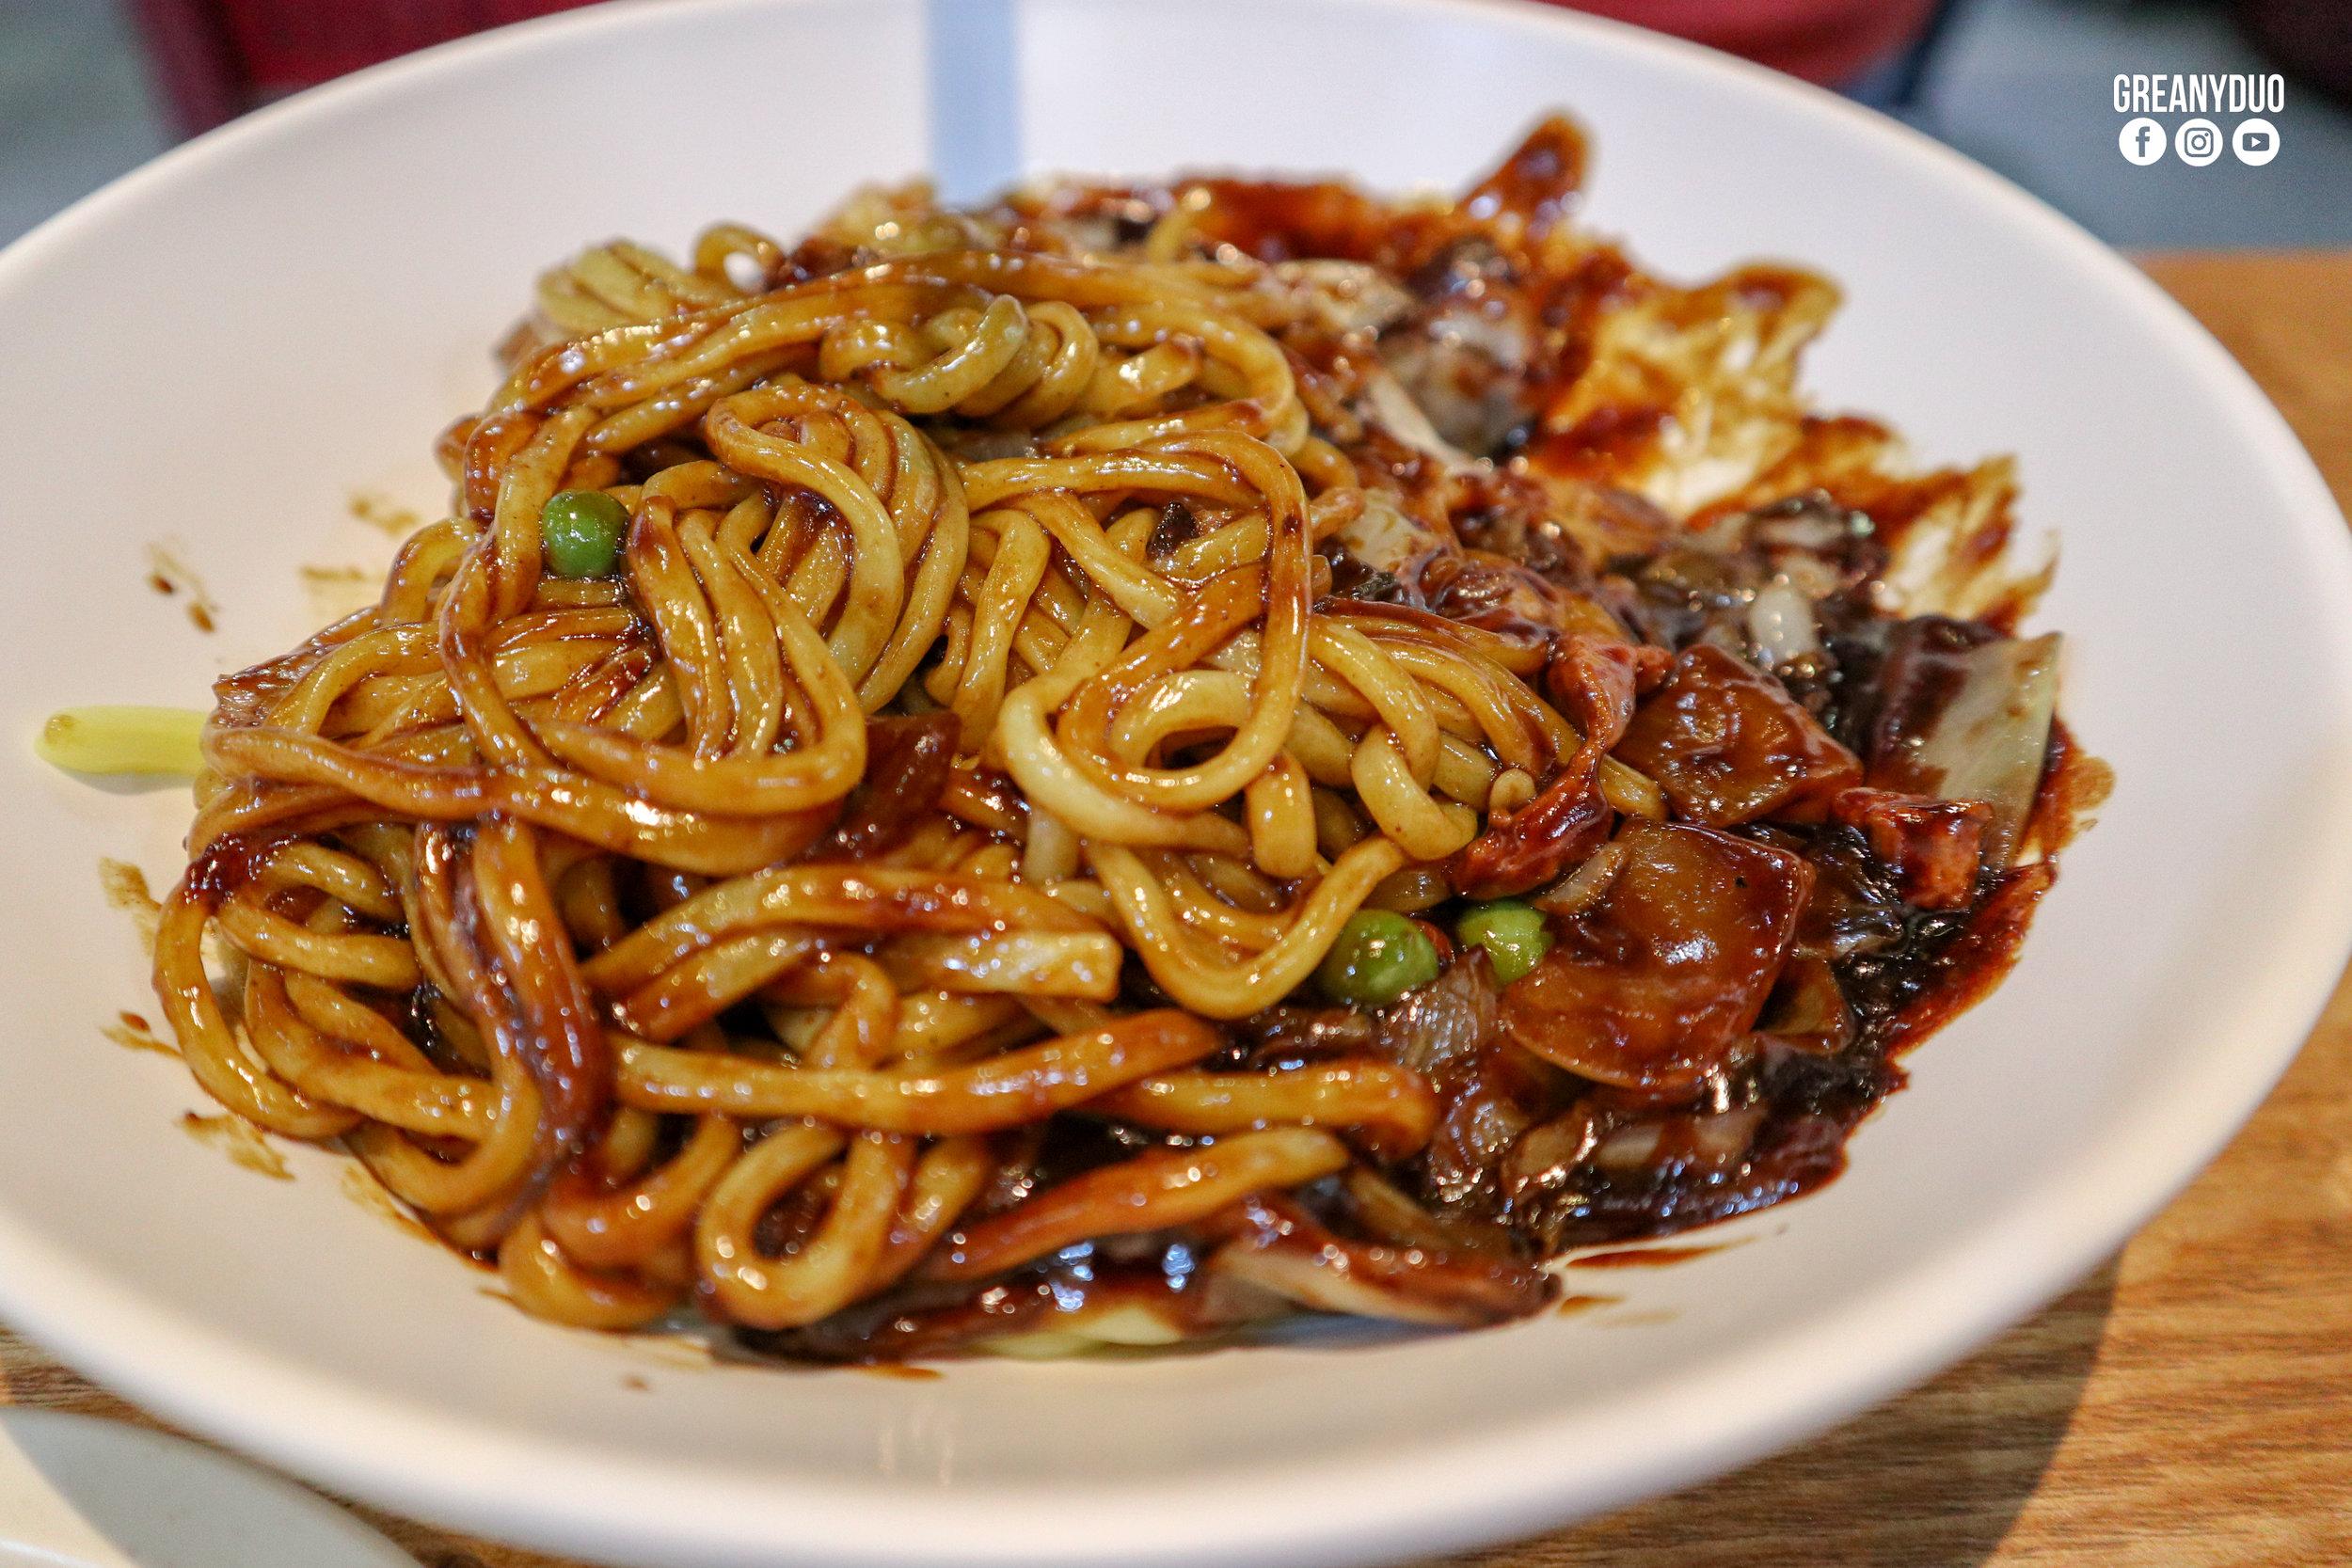 024Seoul_Food_WM.jpg